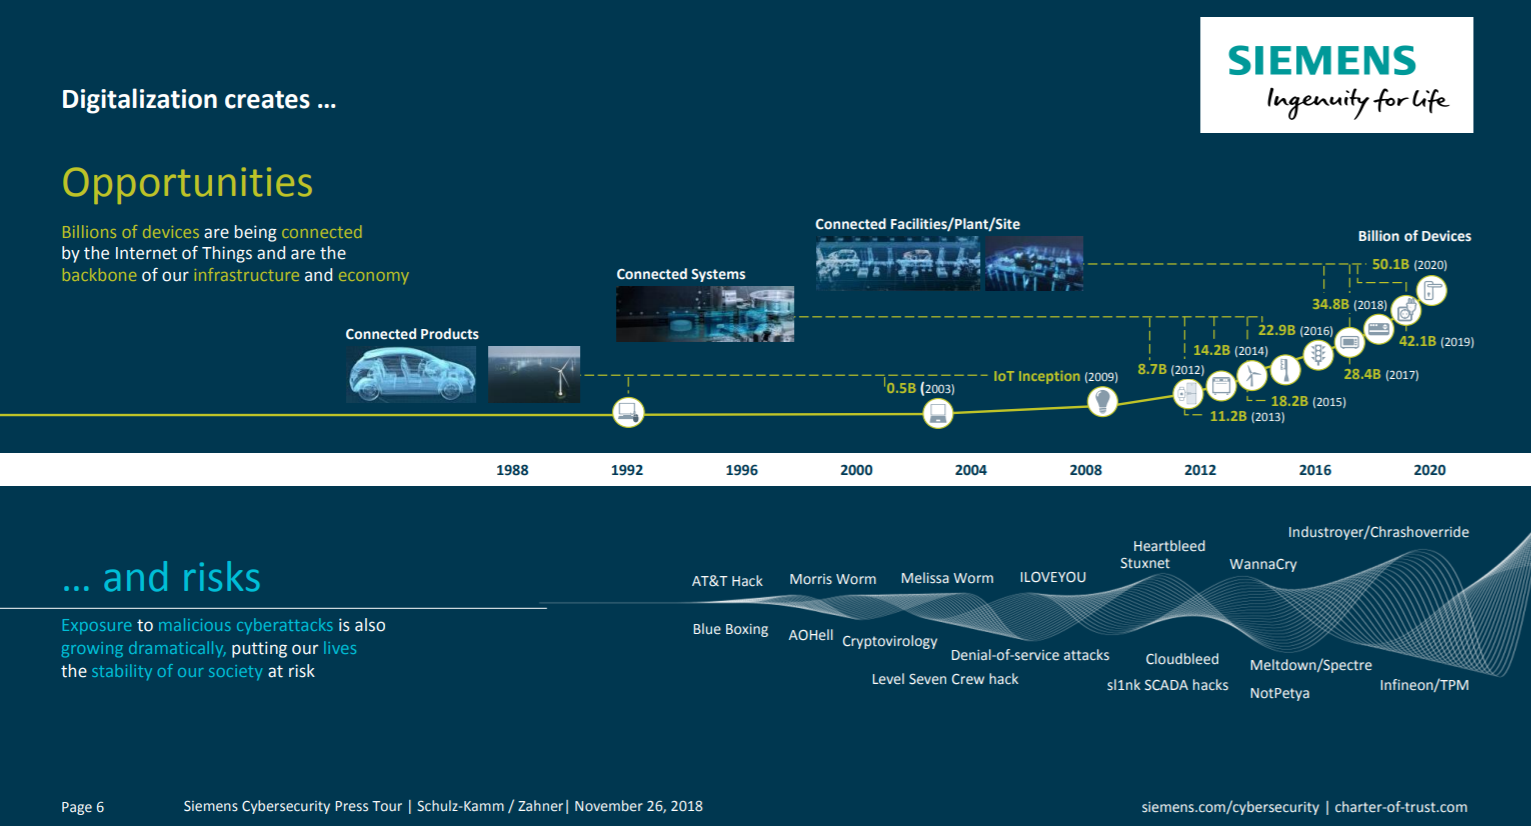 Digitization Timeline